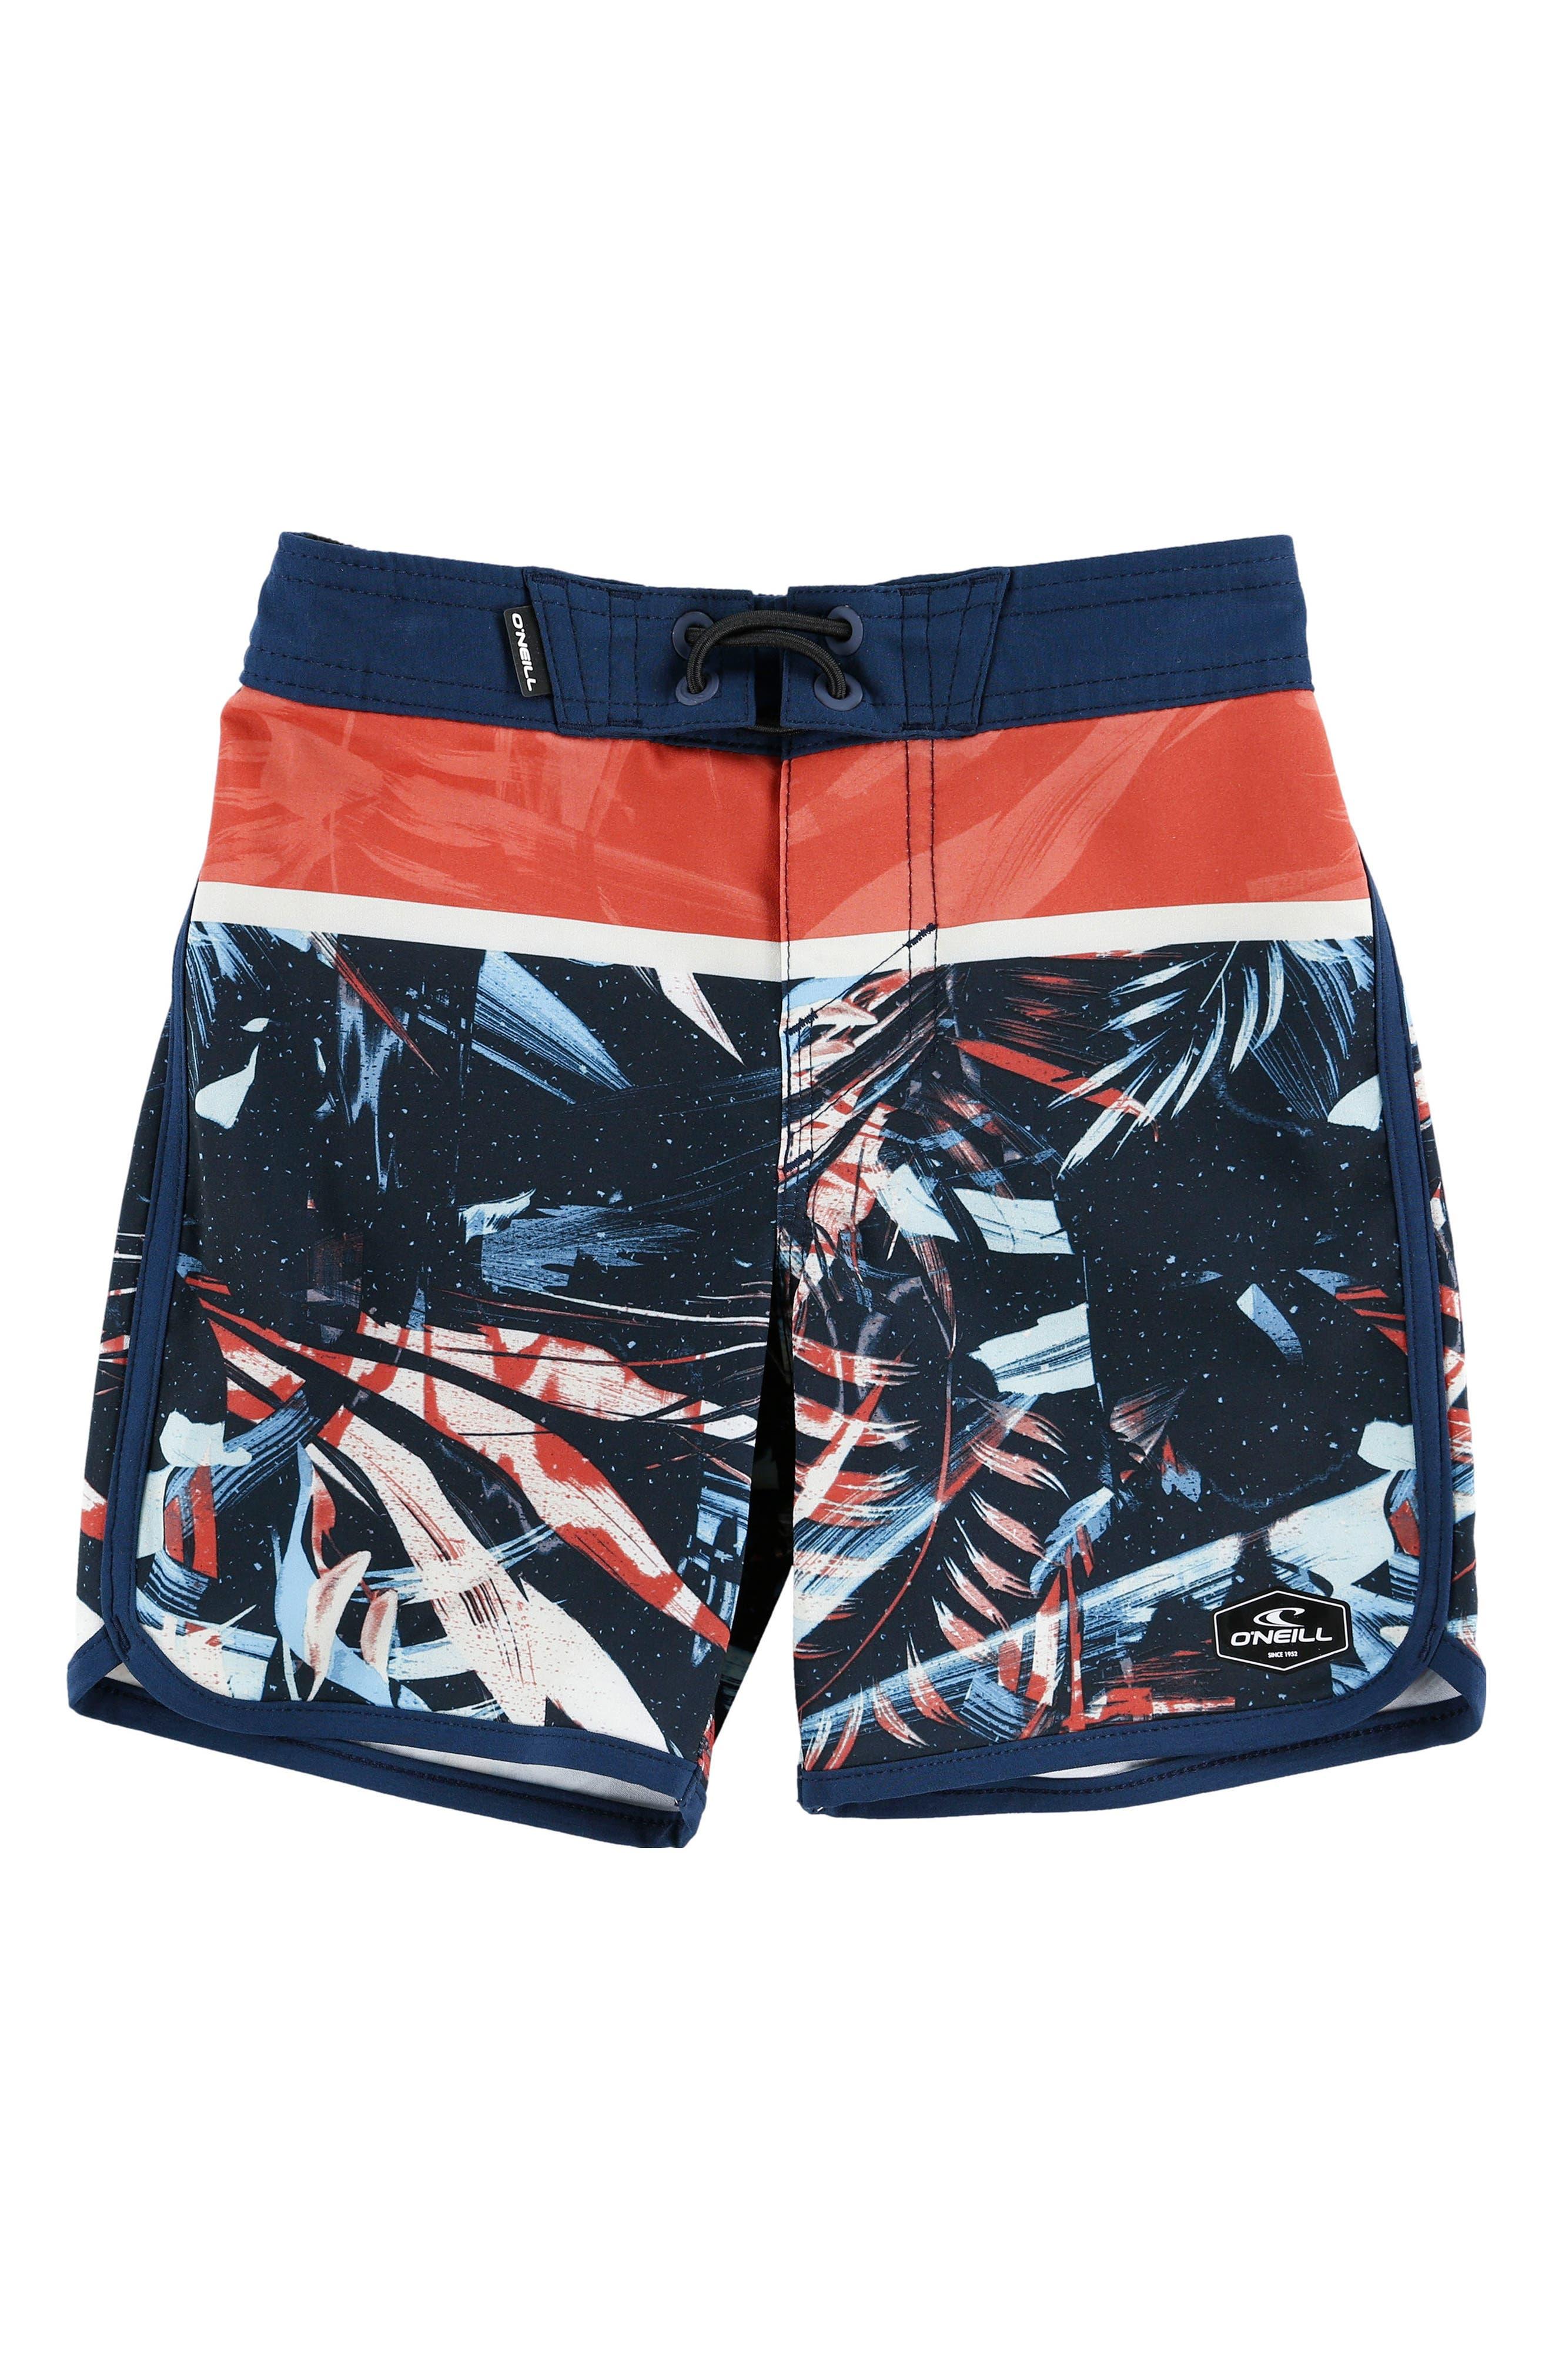 Hyperfreak Ruins Board Shorts,                         Main,                         color, Navy